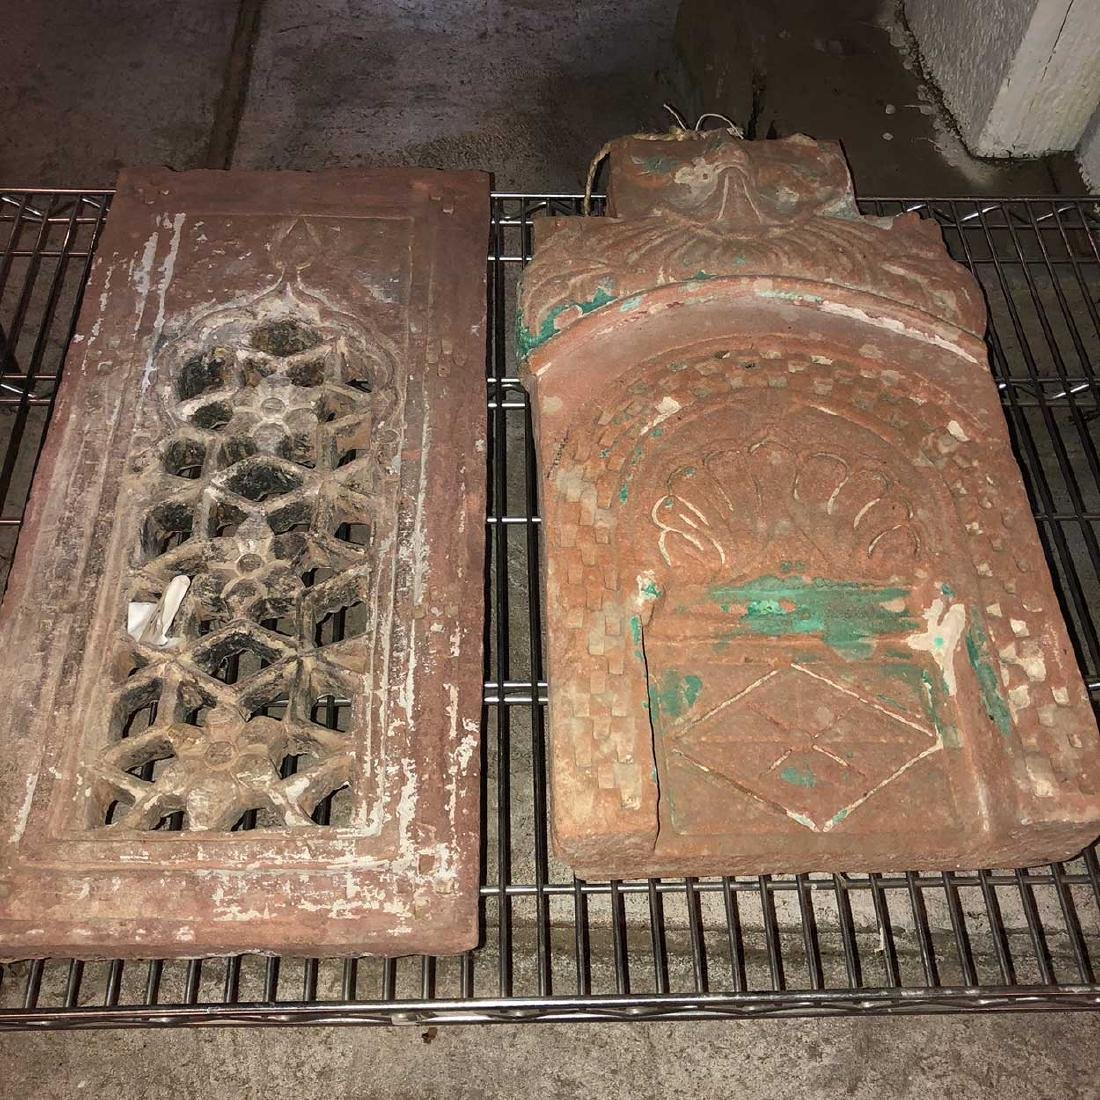 Indian Rajasthani Sandstone Window Screens and Niche